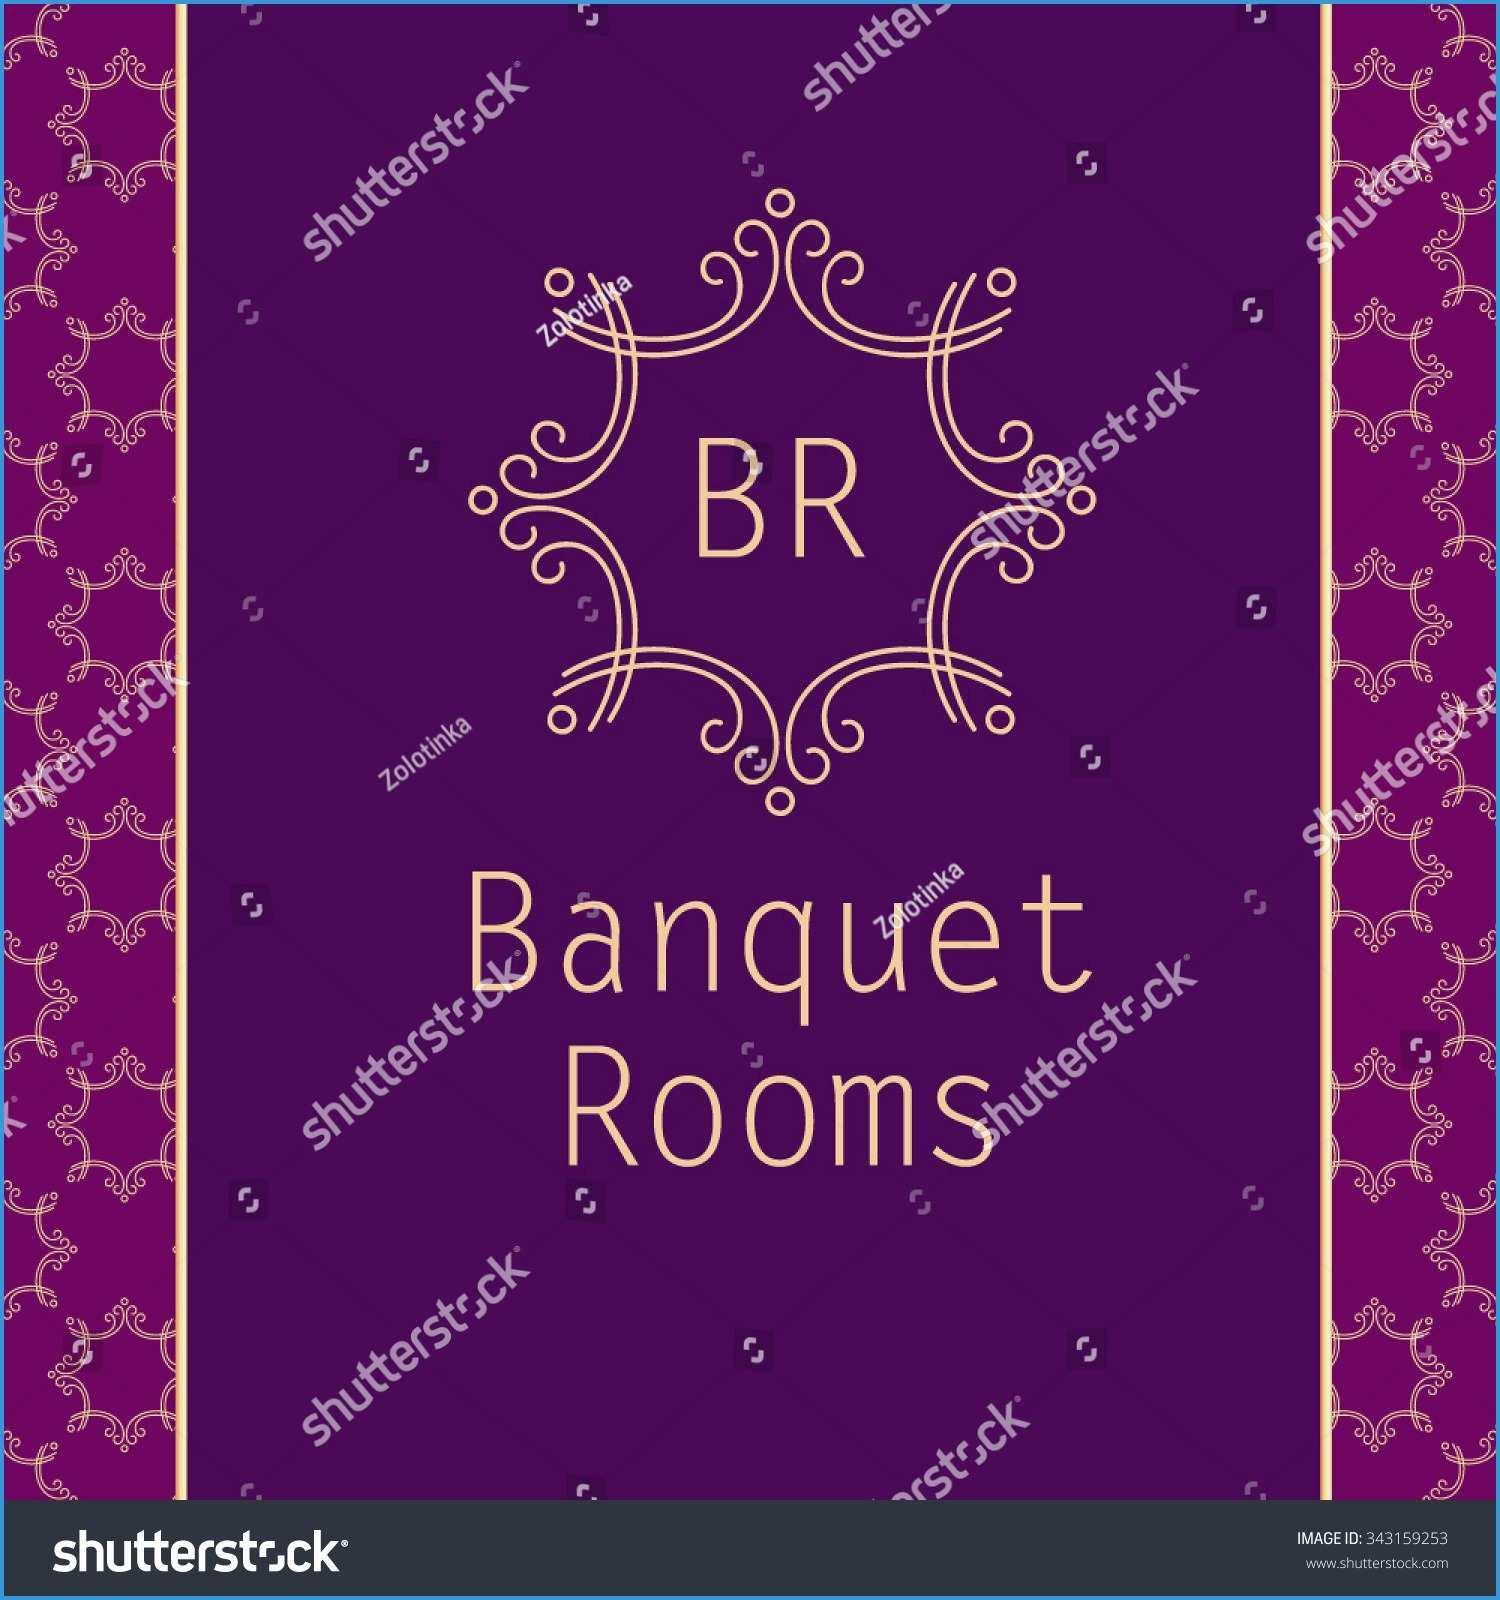 Banquet Hall Website Templates Free